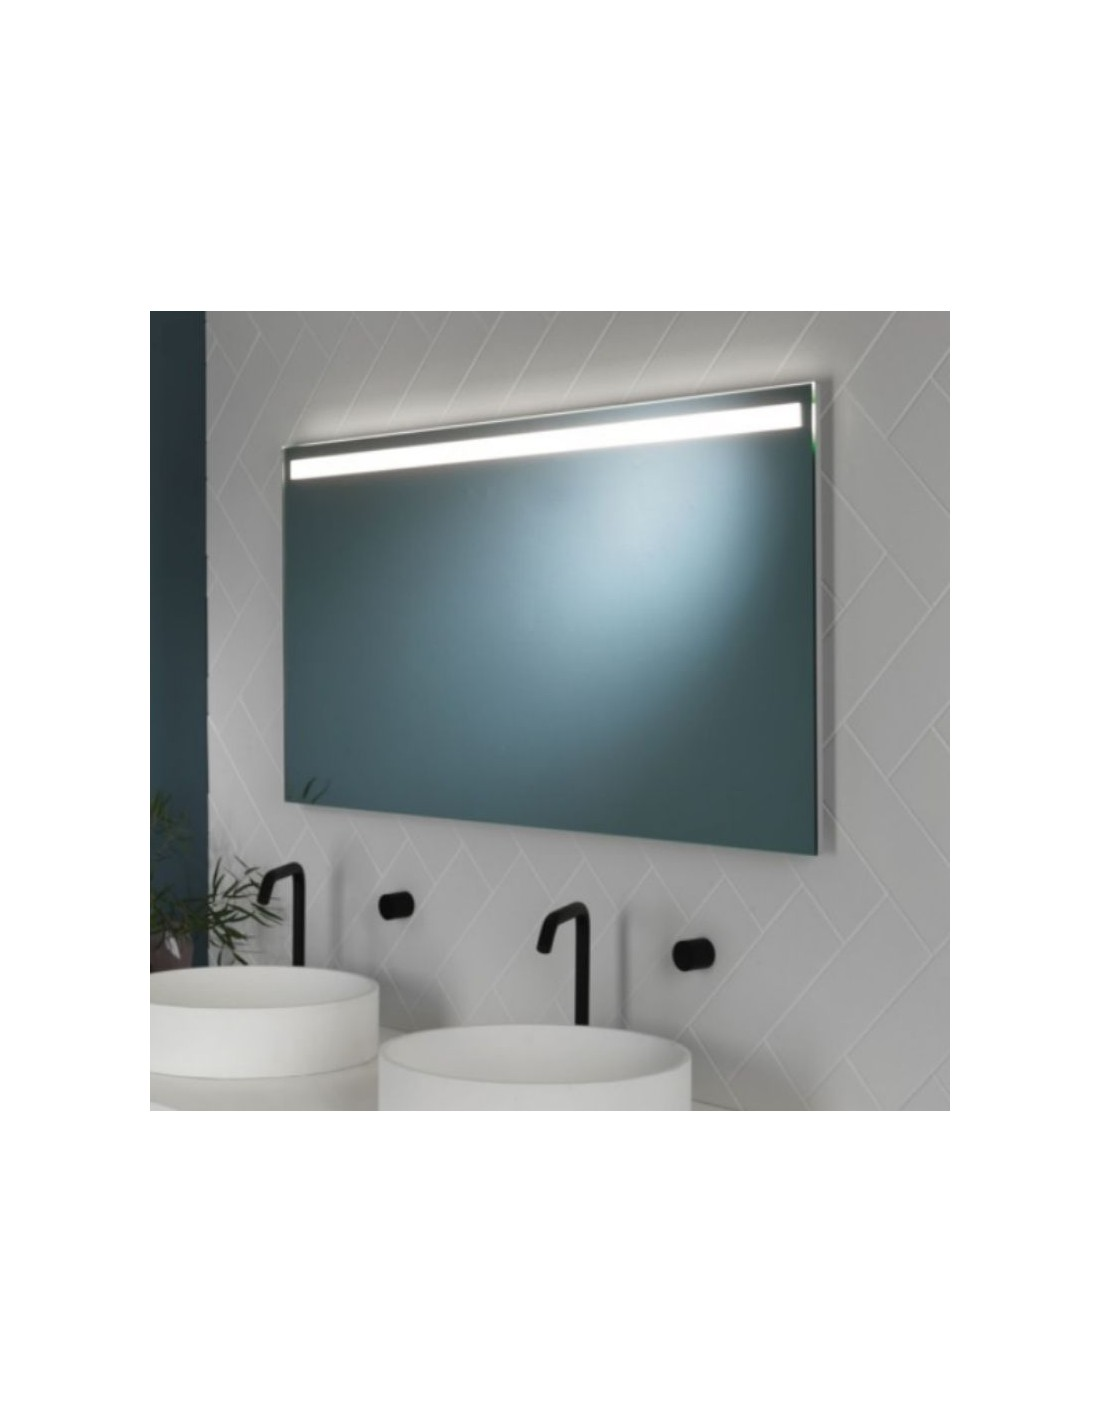 Miroir Avlon 1200 astro lighting vue d\'ensemble - Valente Design